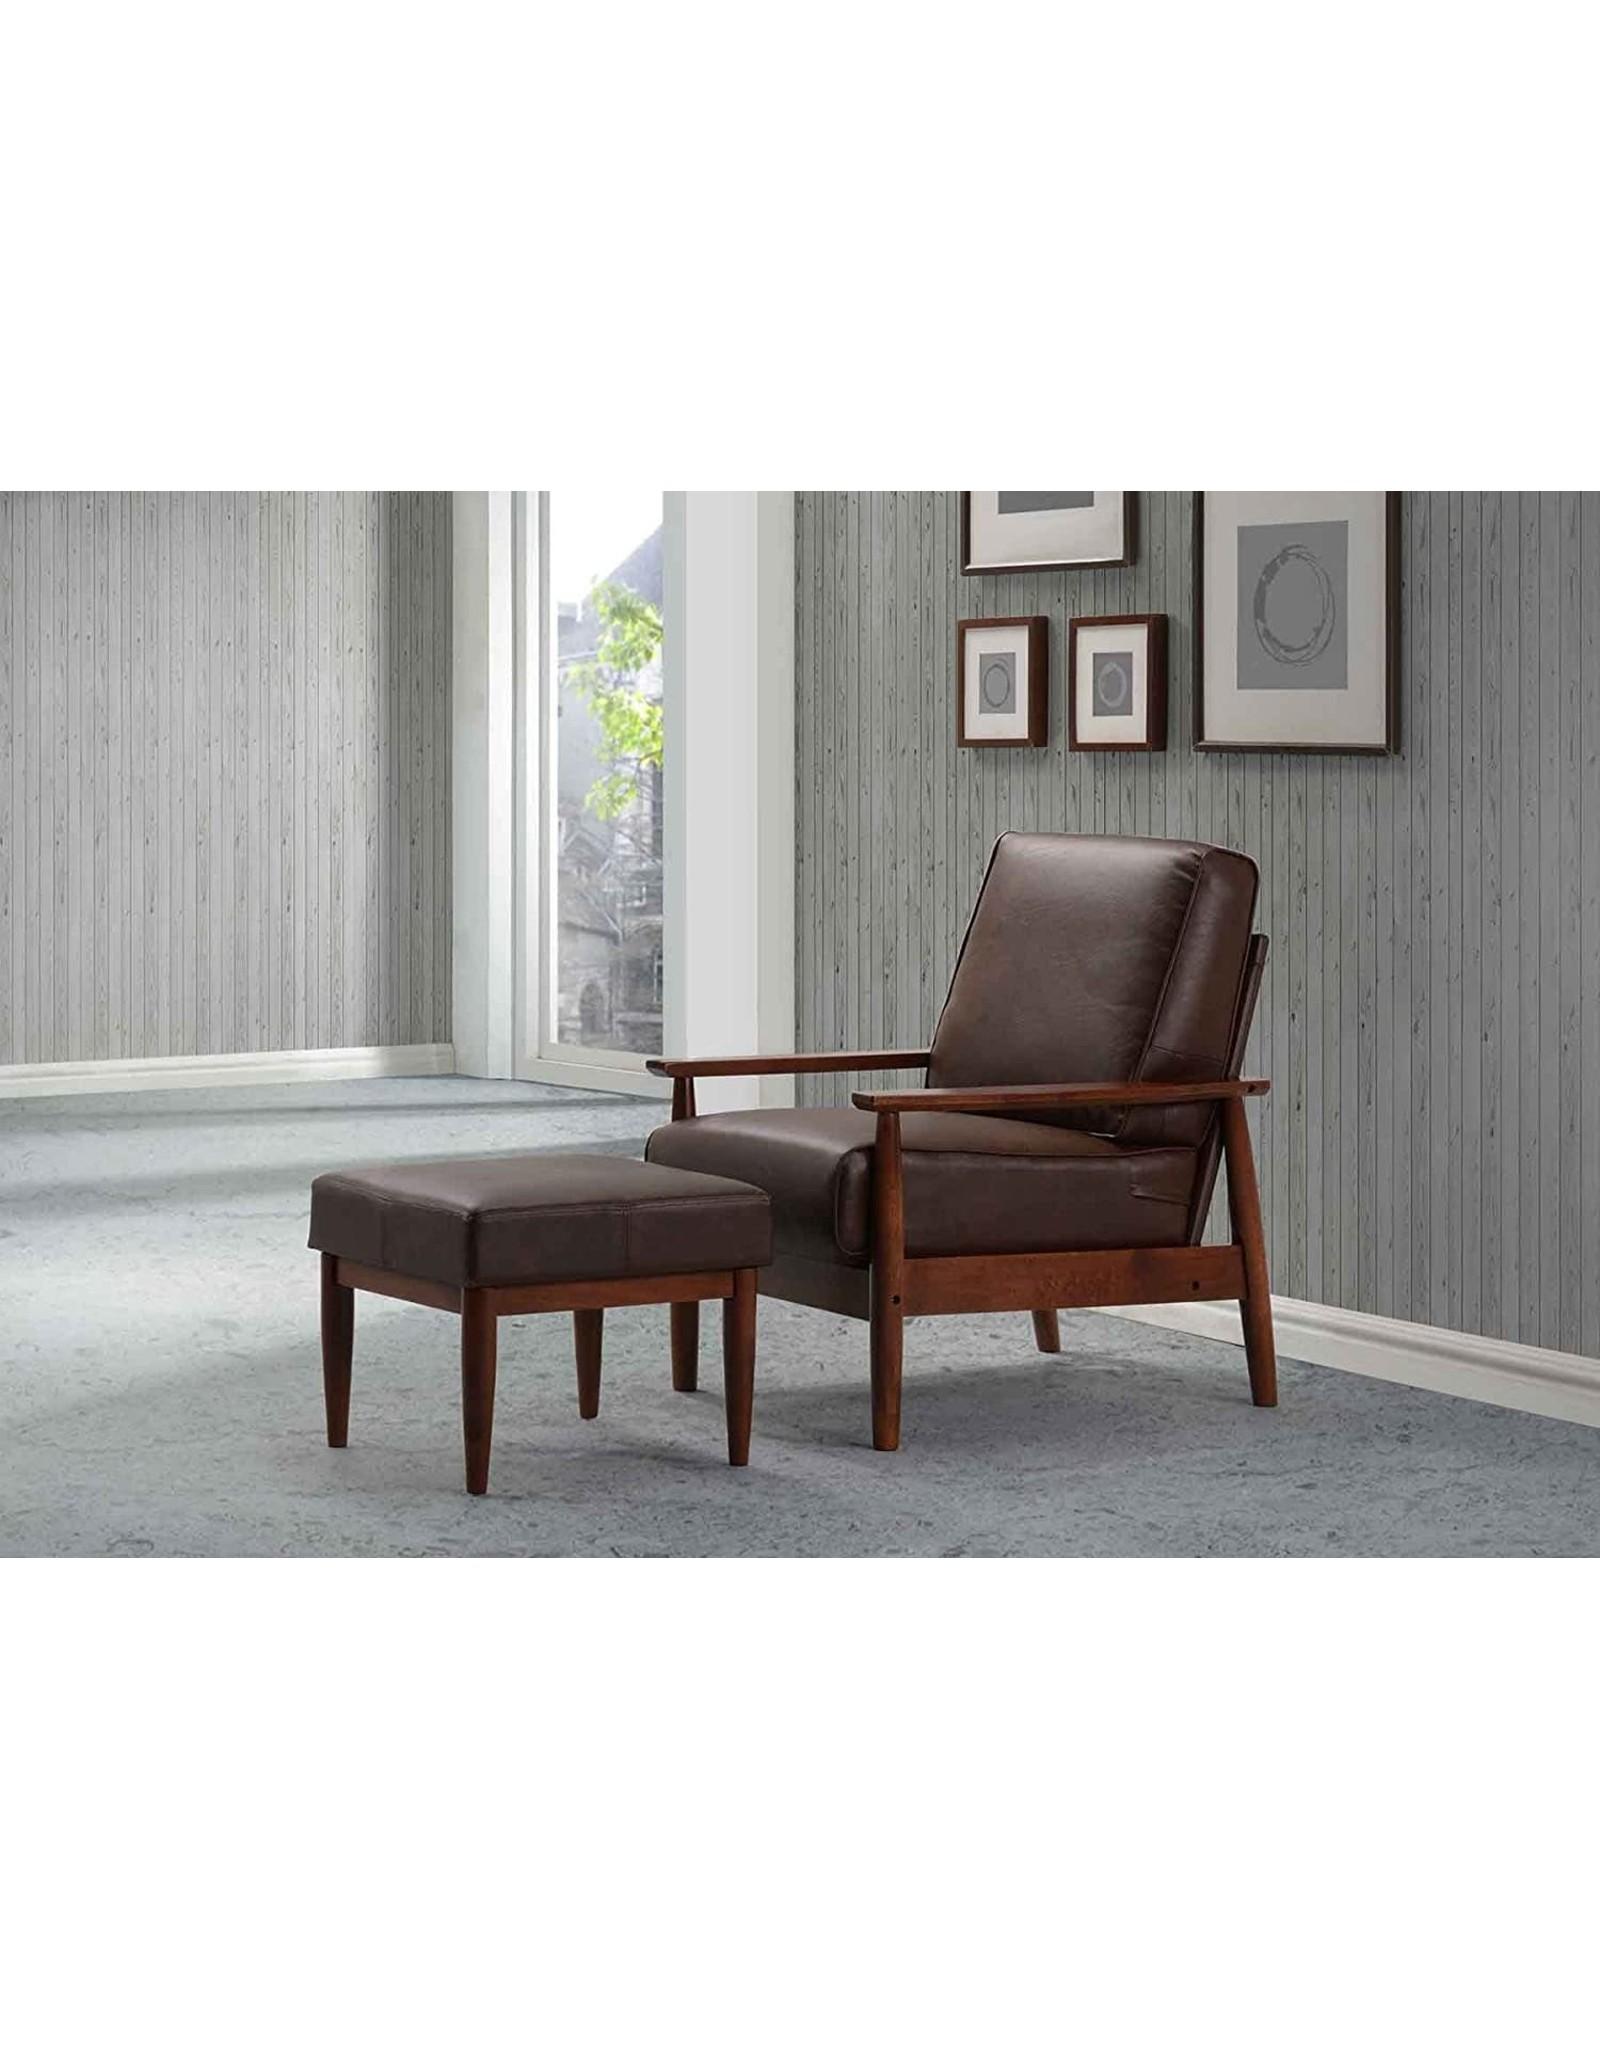 Fat June fat june IT 1190LC CHR-PU GER LTHR DRK B Faux Leather Bergen Chair, Dark Brown